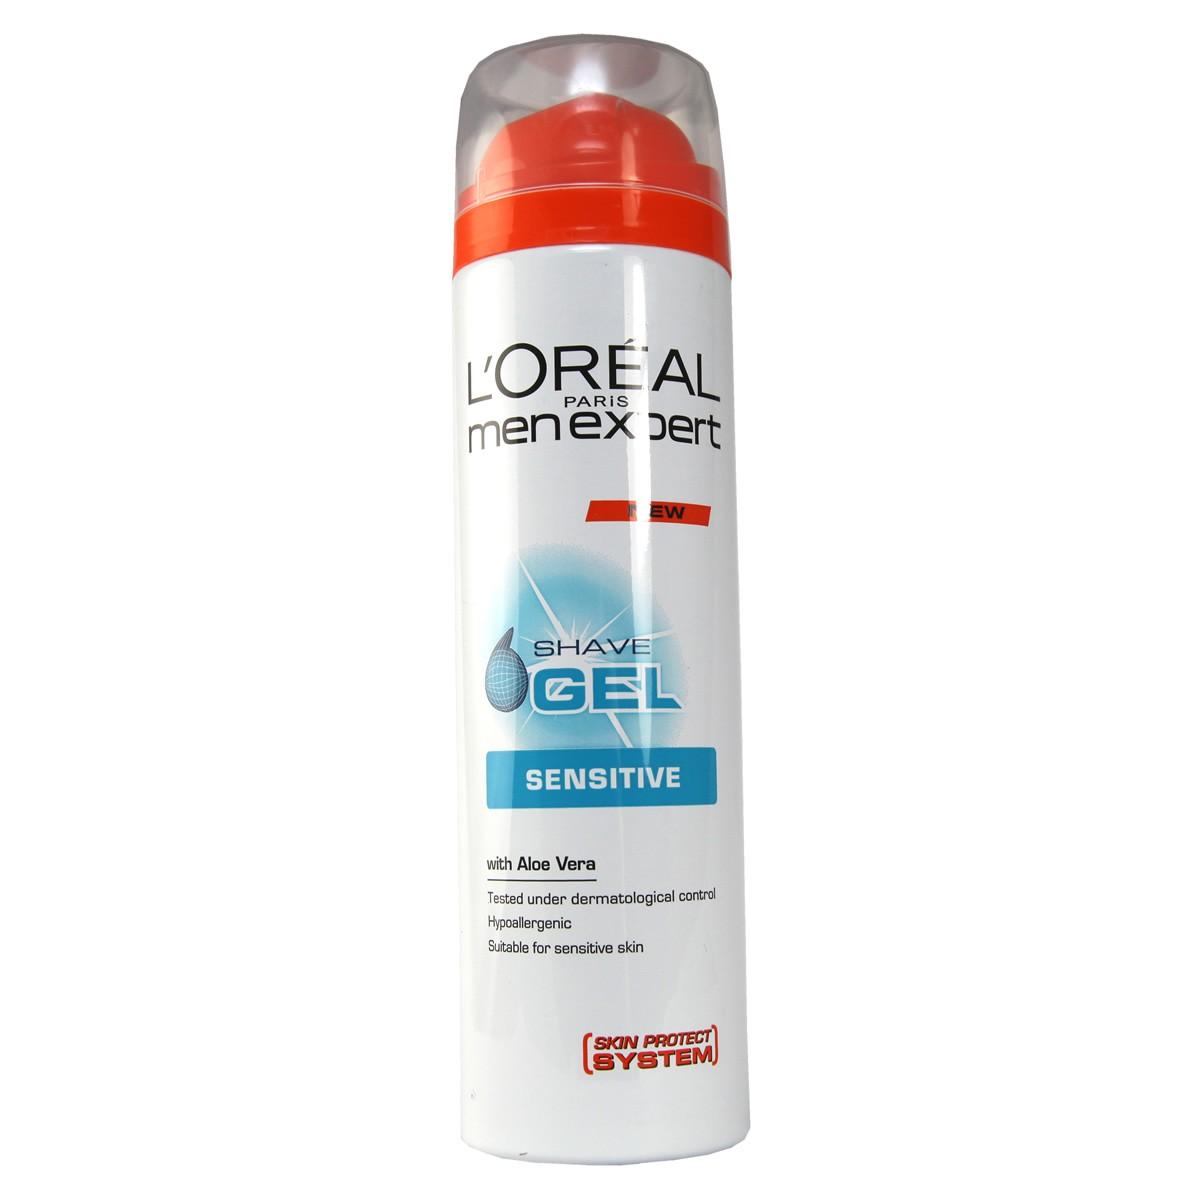 L'Oreal Paris Men Expert Hydra Sensitive Shave Gel